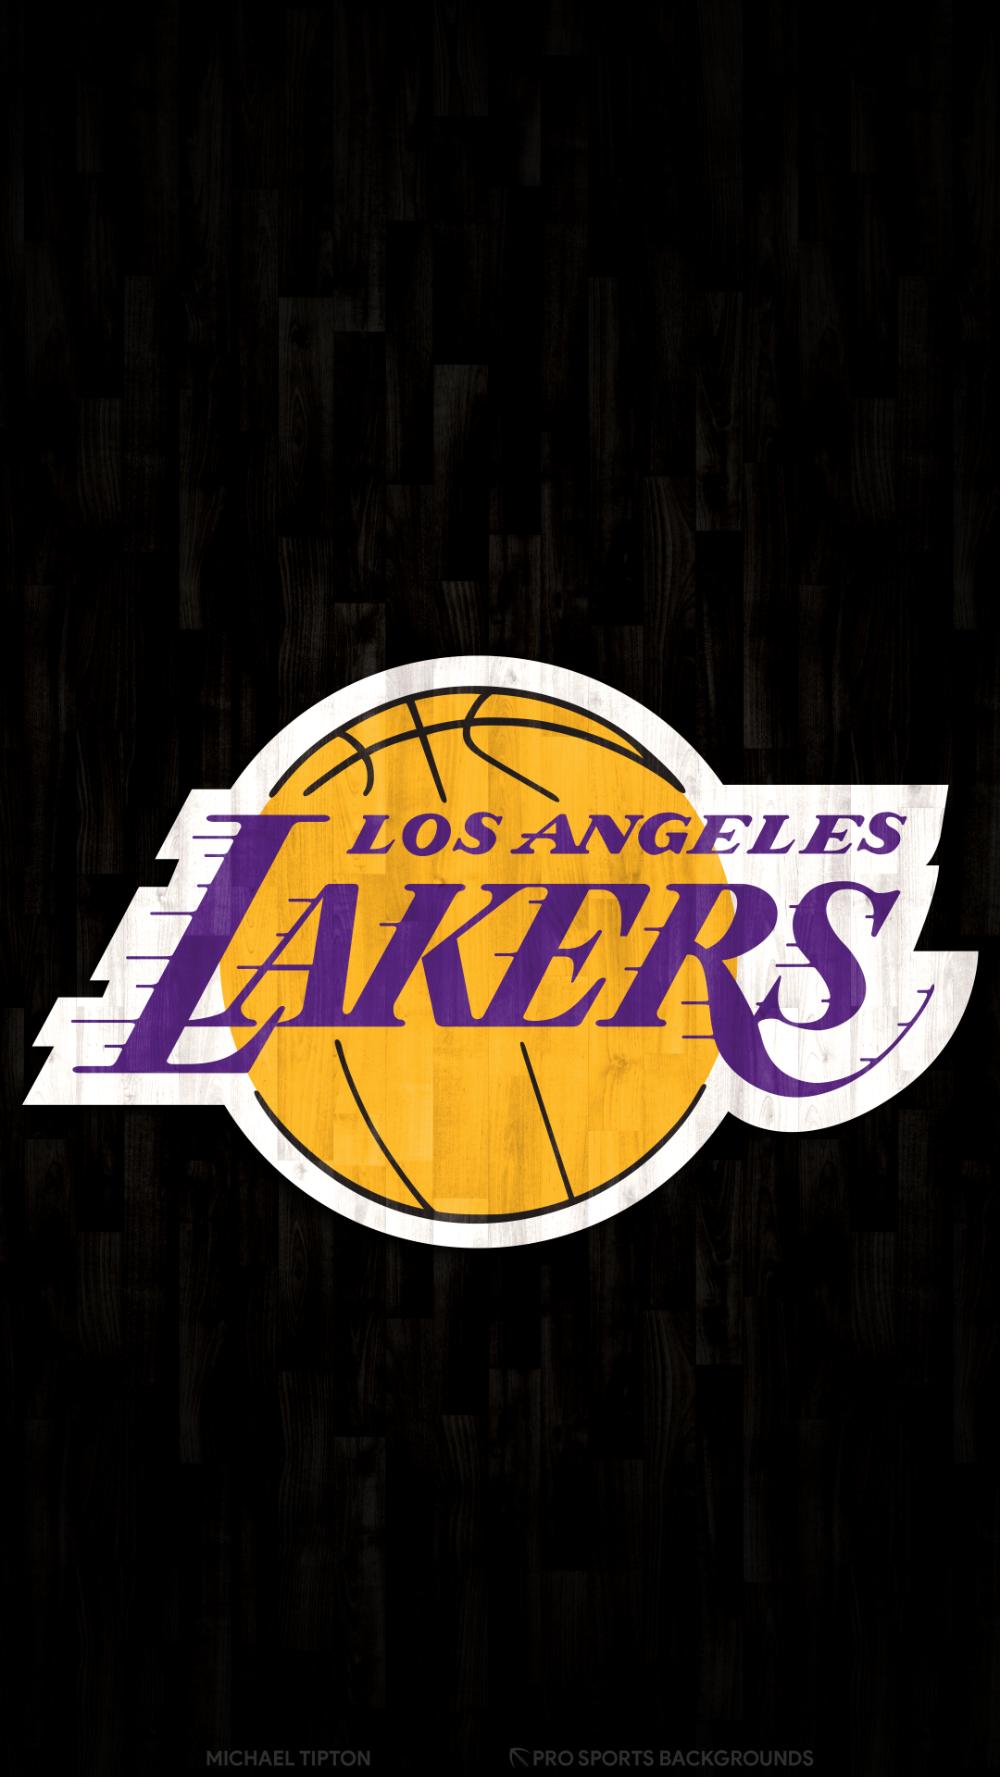 Los Angeles Lakers Wallpapers Lakers wallpaper, Los